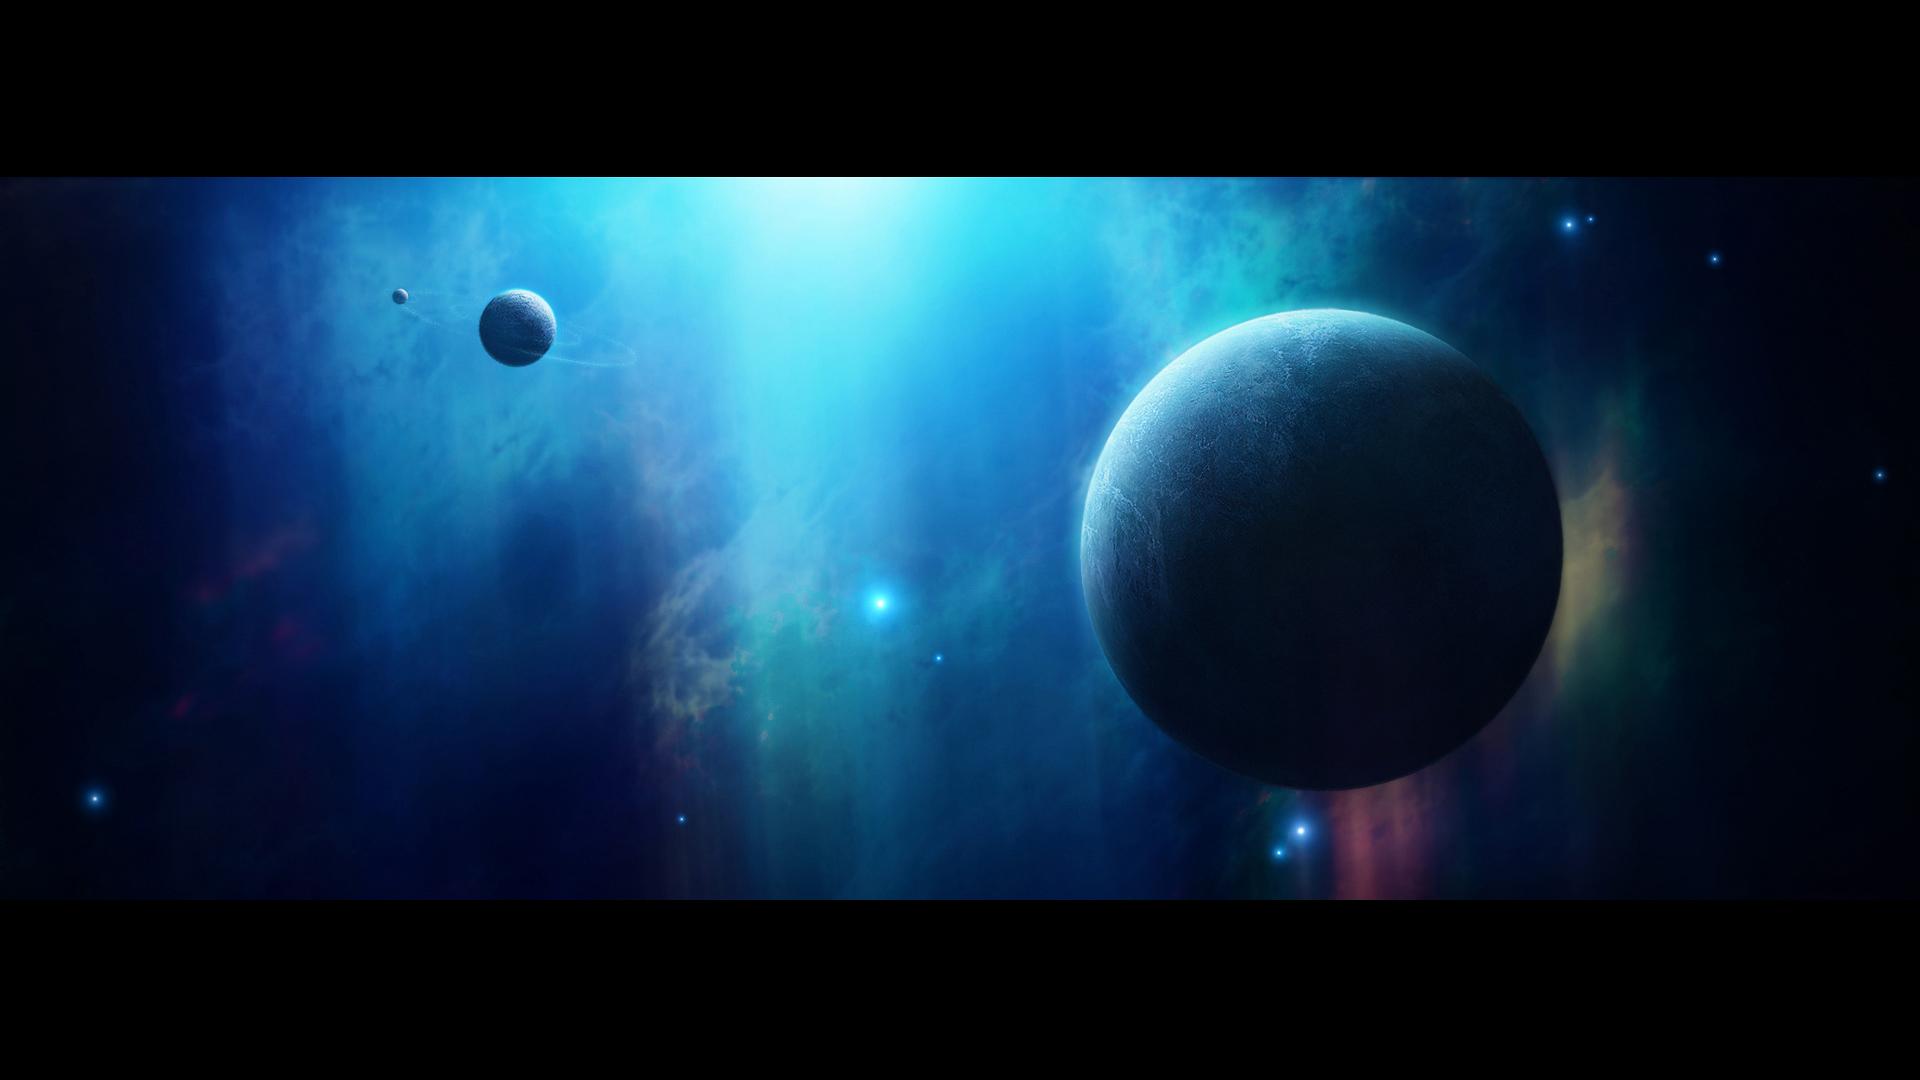 Blue Serenity II by pogona2009